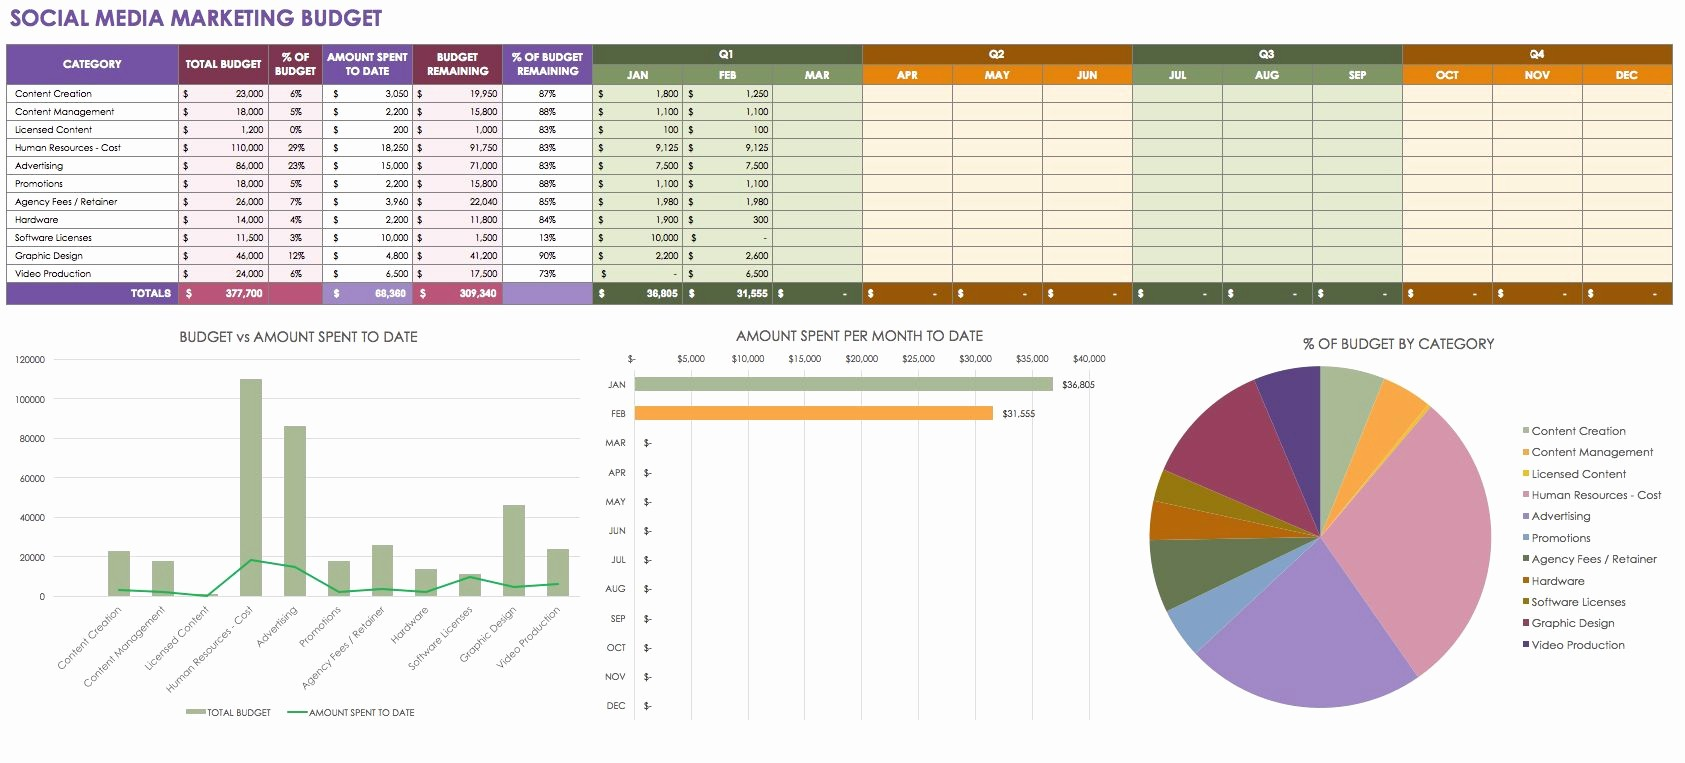 Social Media Report Template Download New Fbbcdcefbcddc social Media Report Template Download